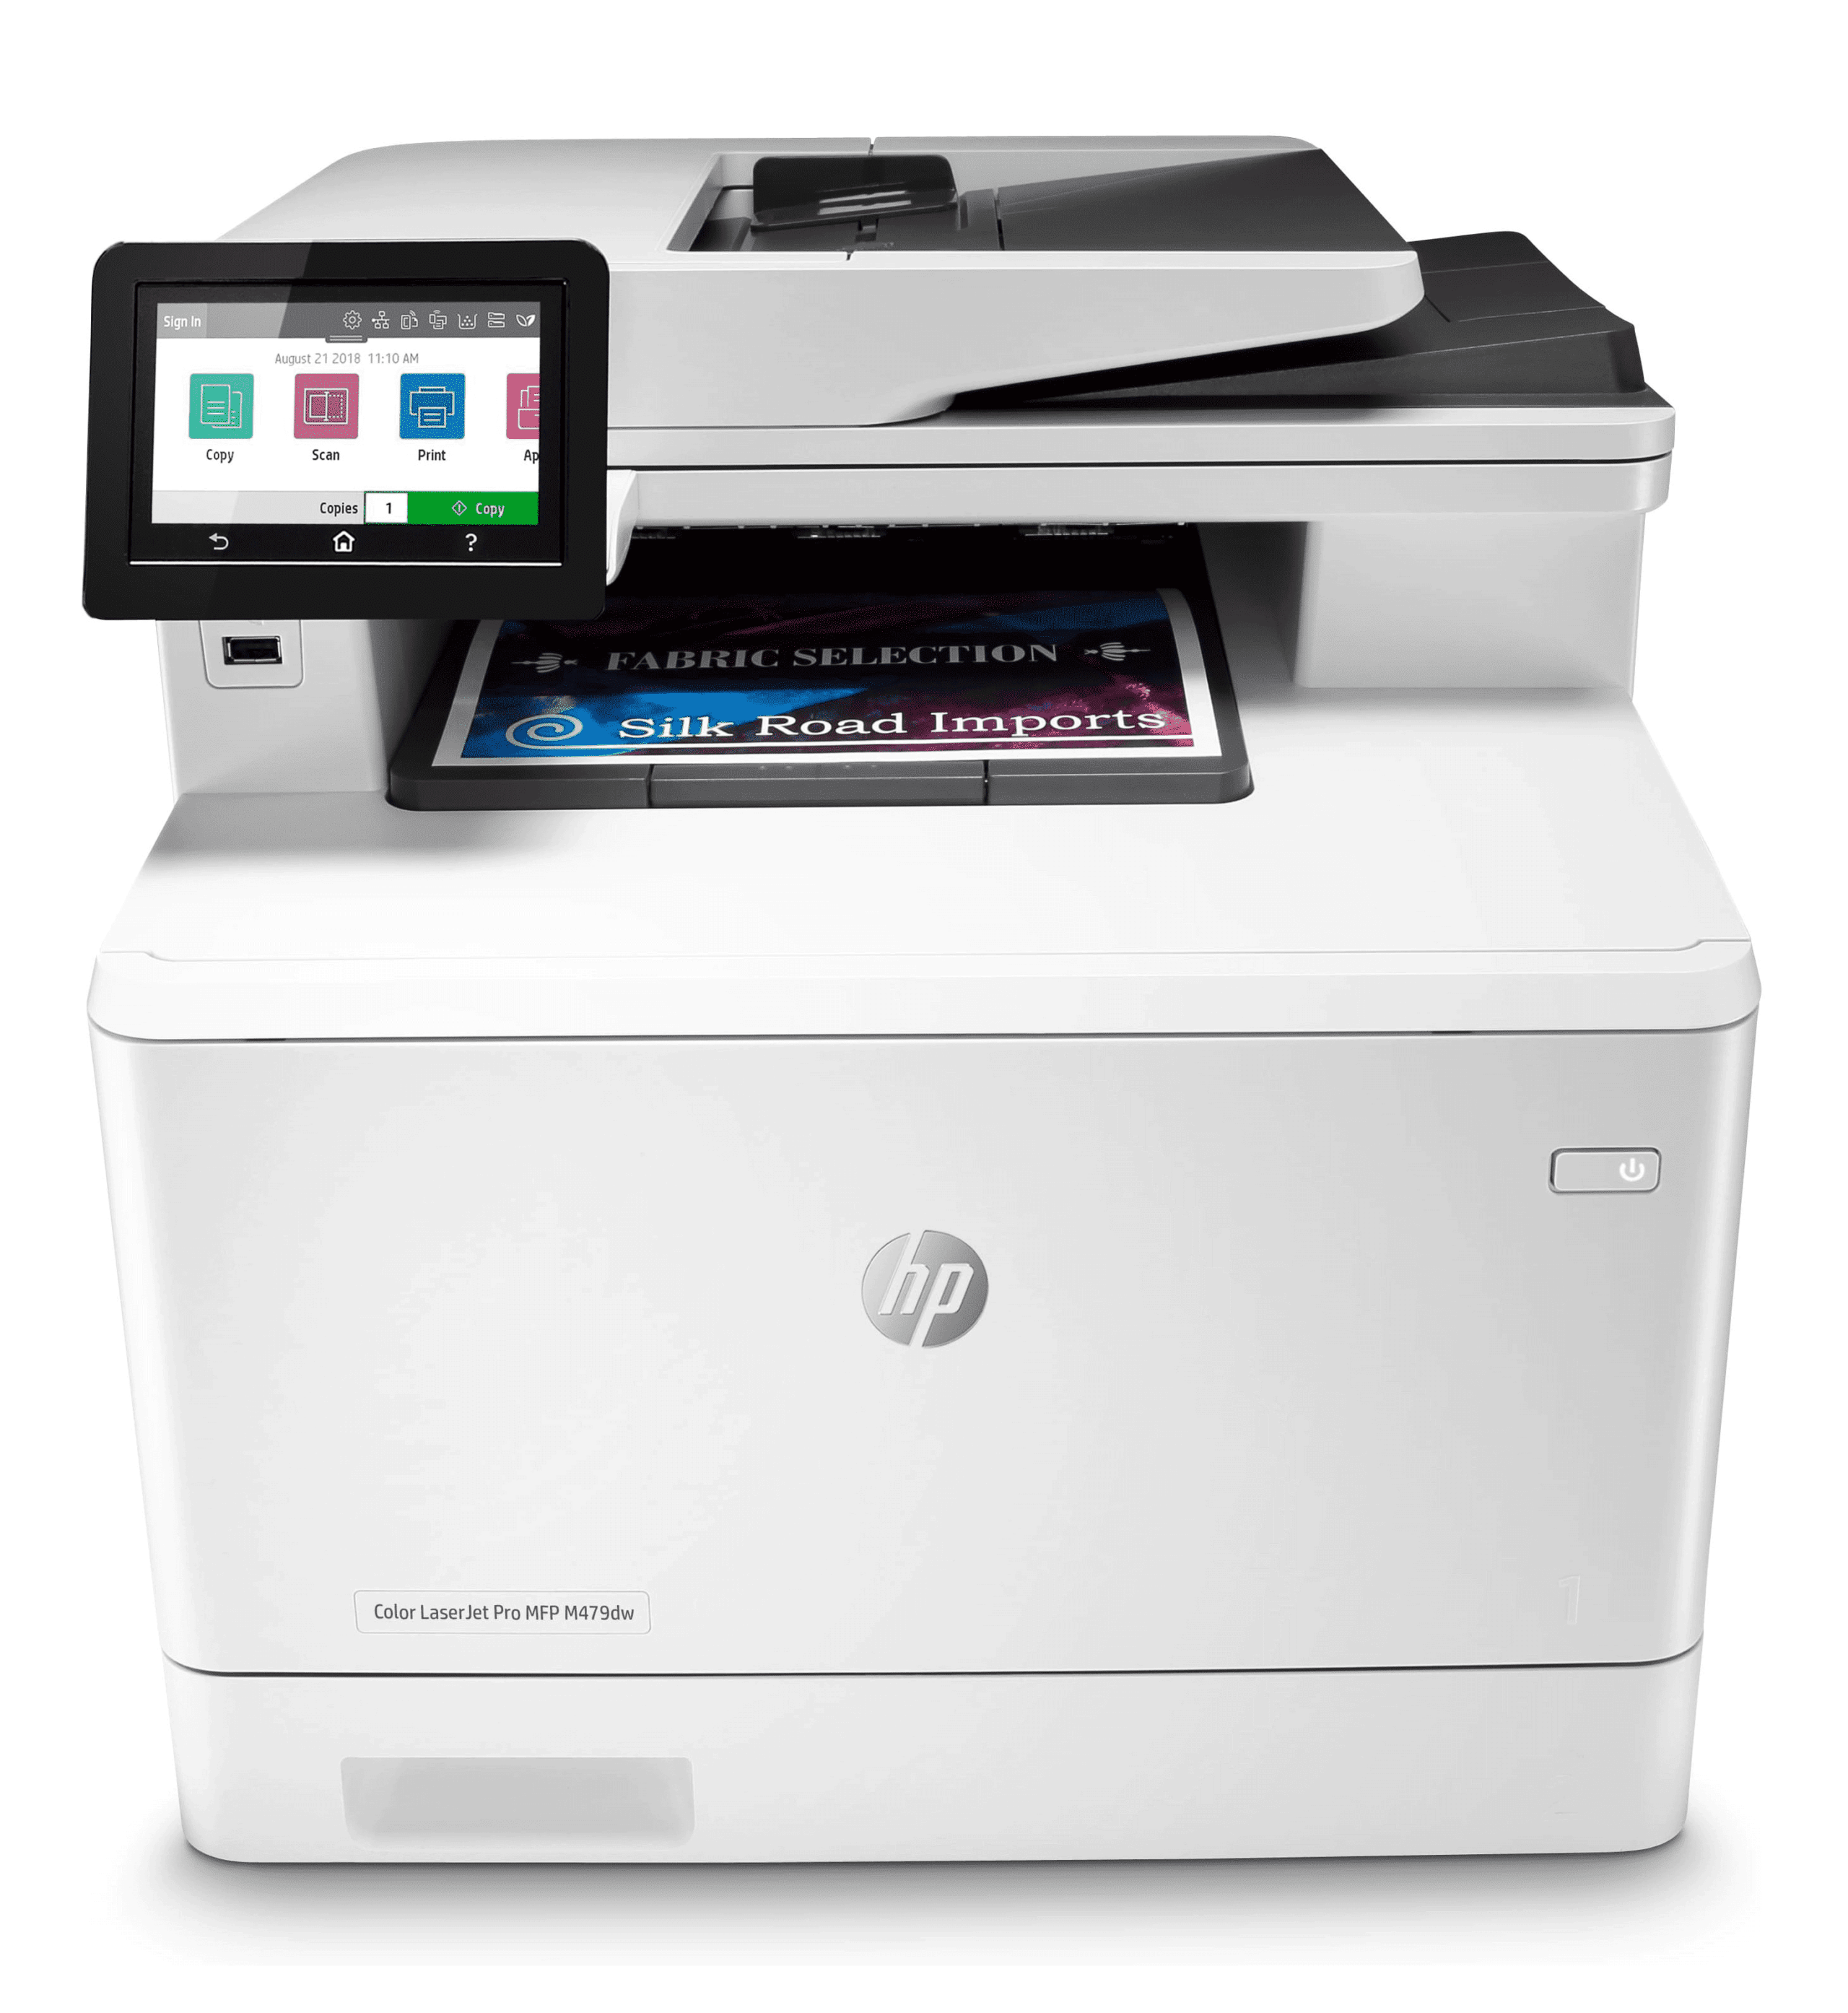 hp-color-laserjet-pro